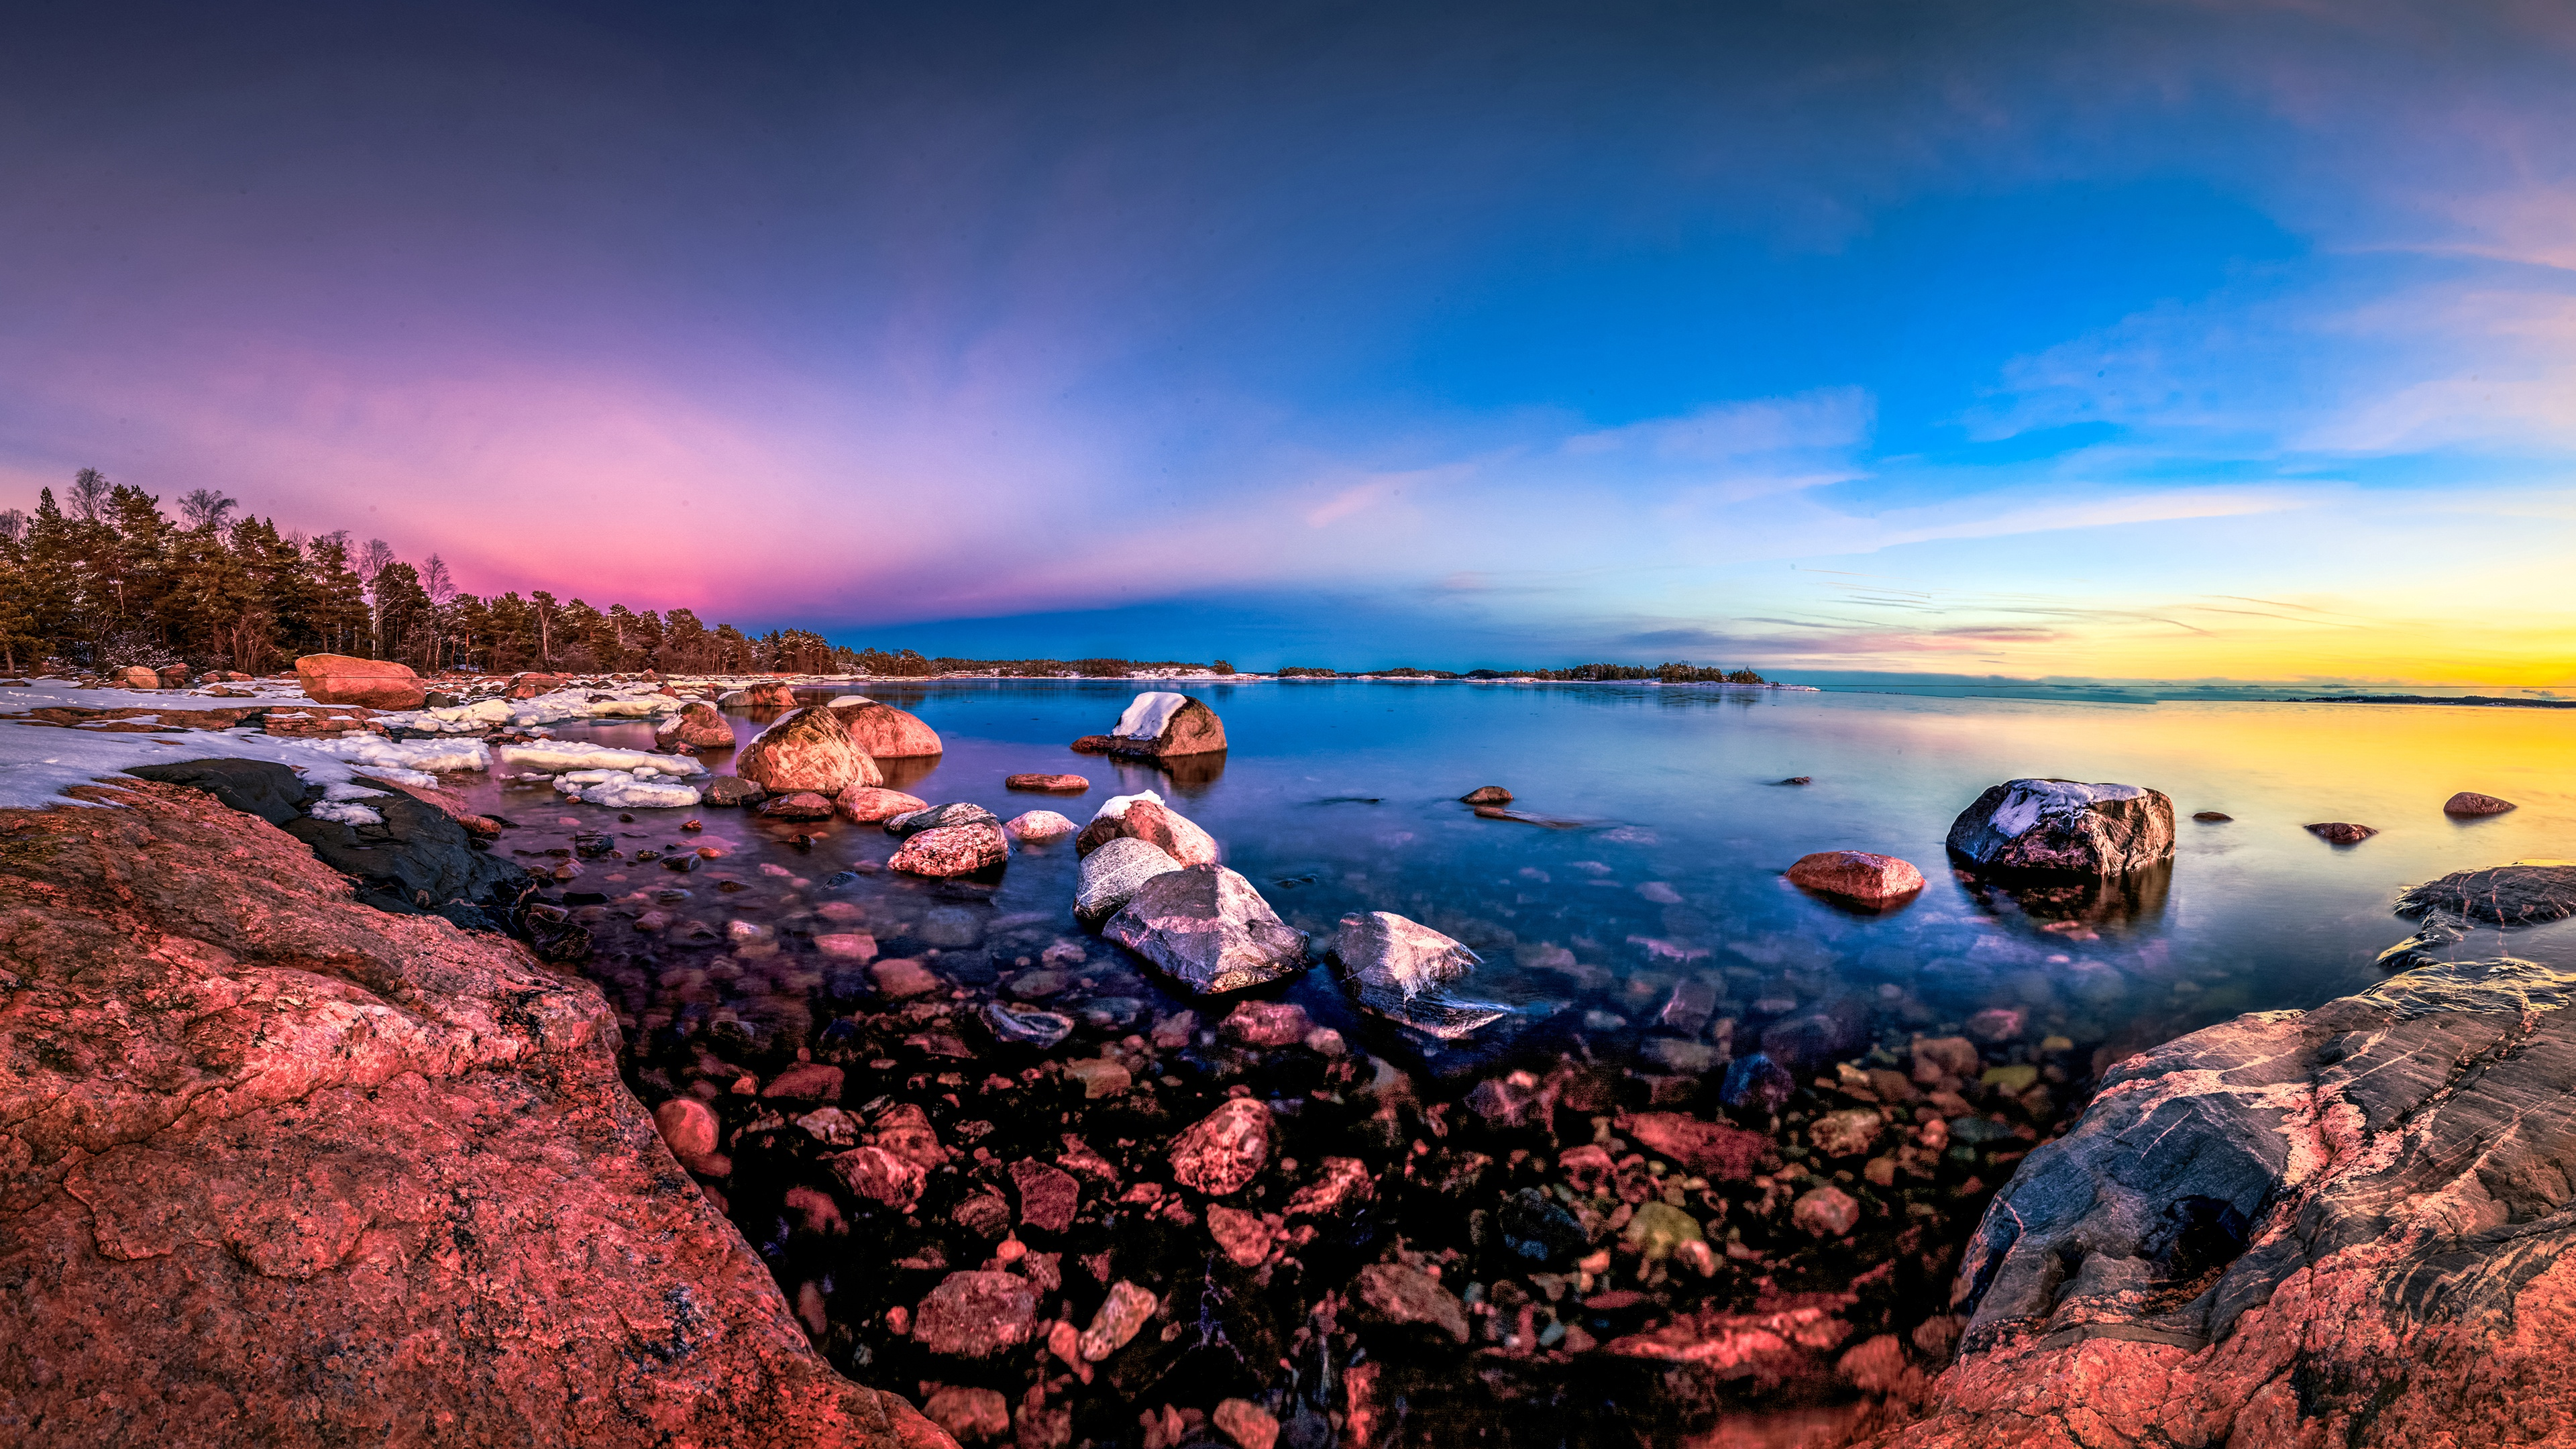 Vibrant Nature Ocean 4k, HD Nature, 4k Wallpapers, Images ...